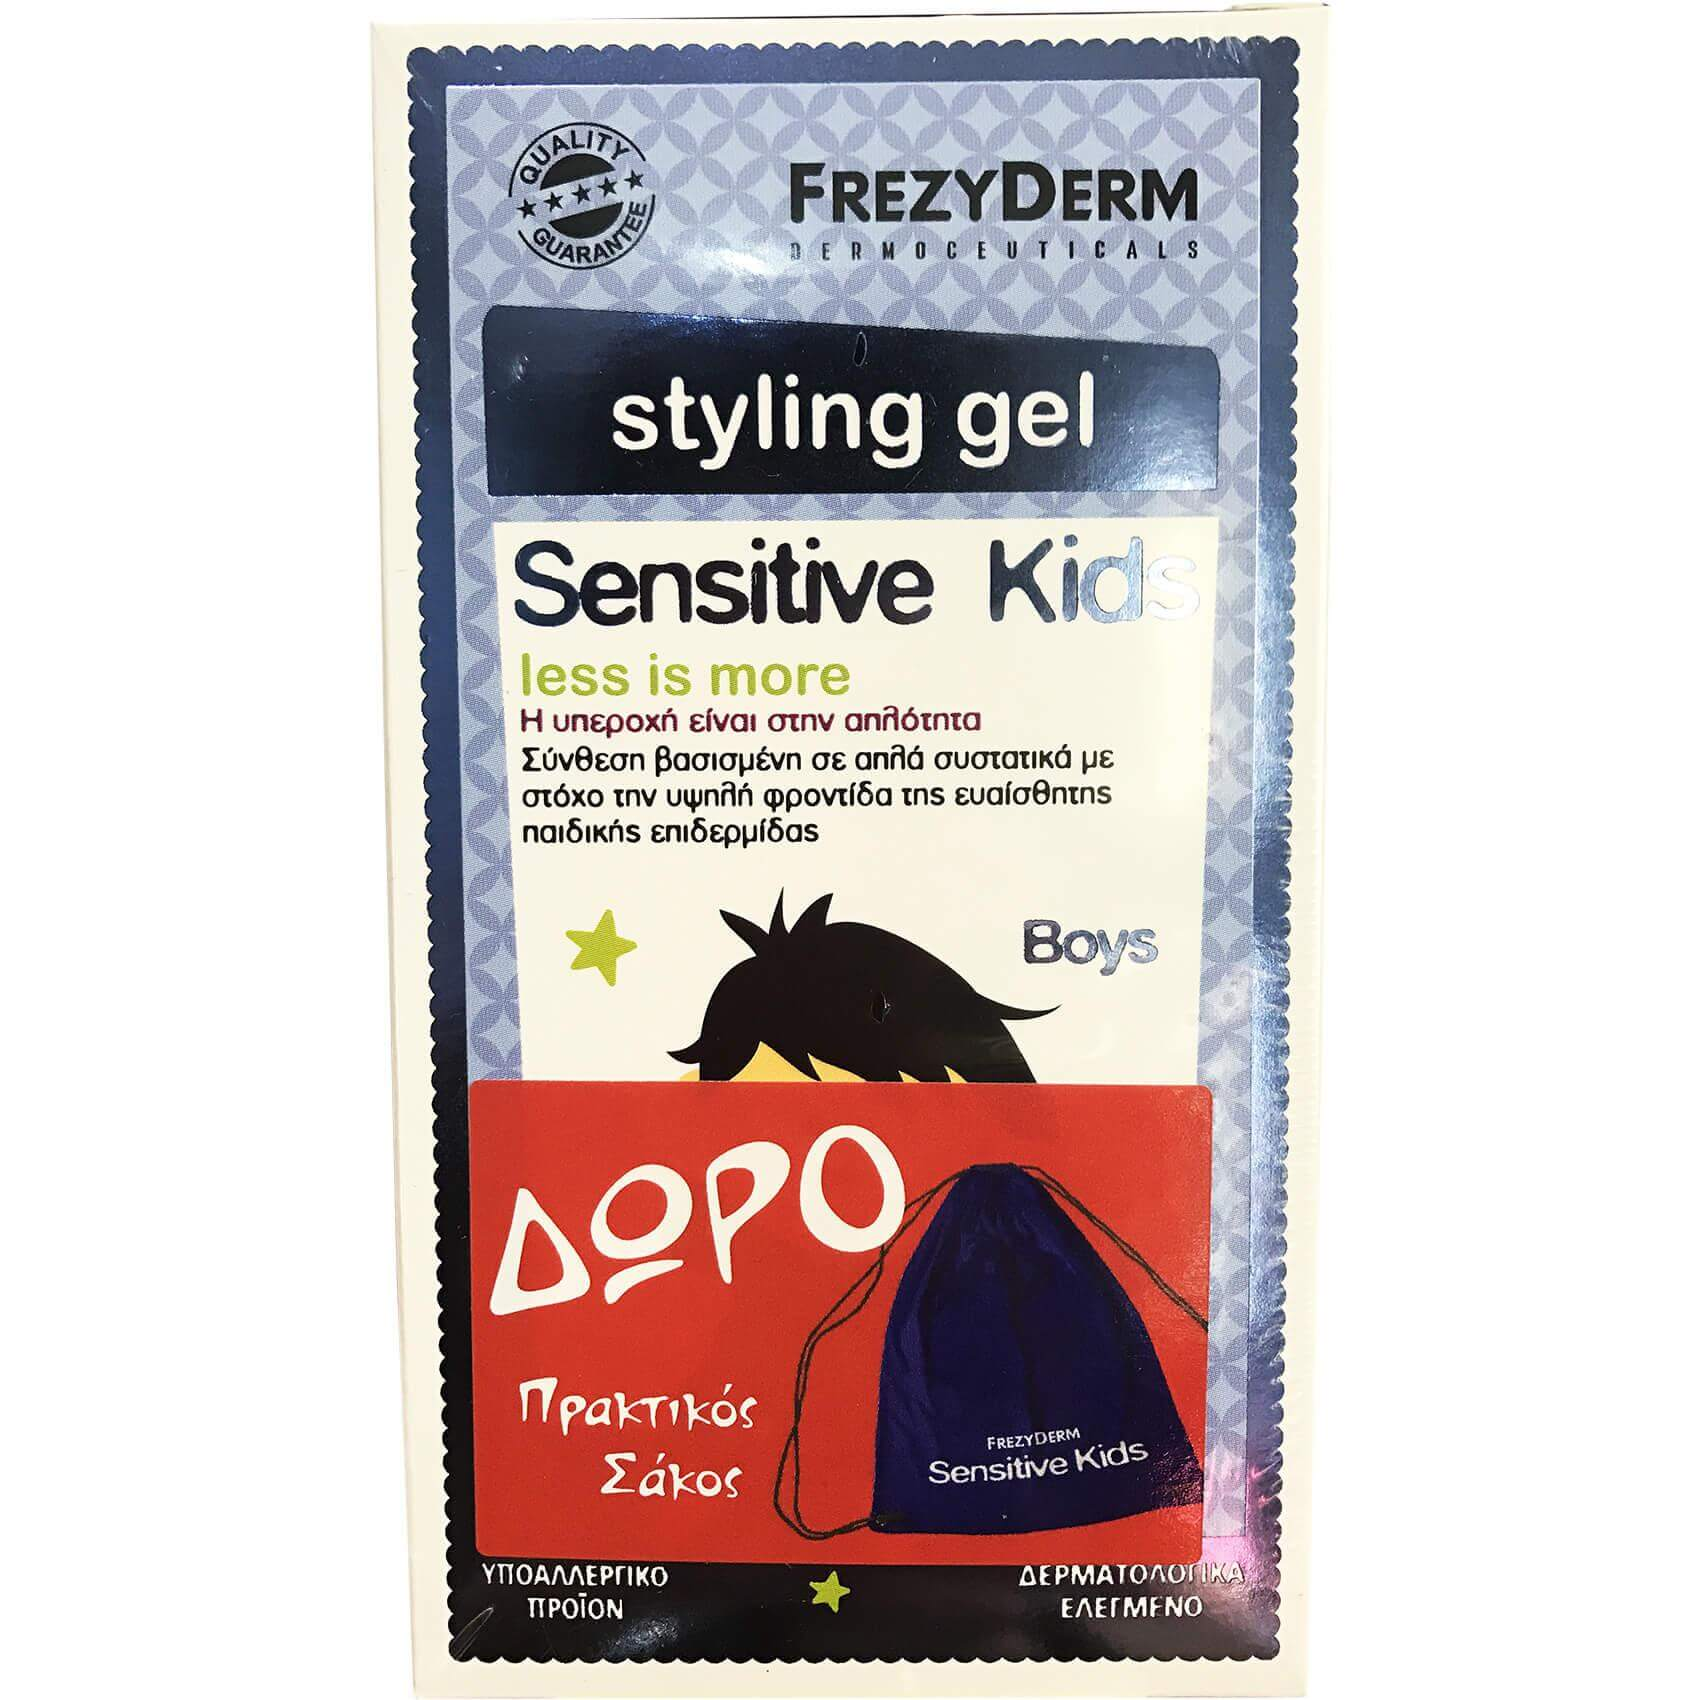 Frezyderm Πακέτο Προσφοράς Sensitive Kids Hair Styling Gel for Boys Απαλό Gel για Δυνατό Κράτημα 100ml & Δώρο Πρακτικός Σάκος